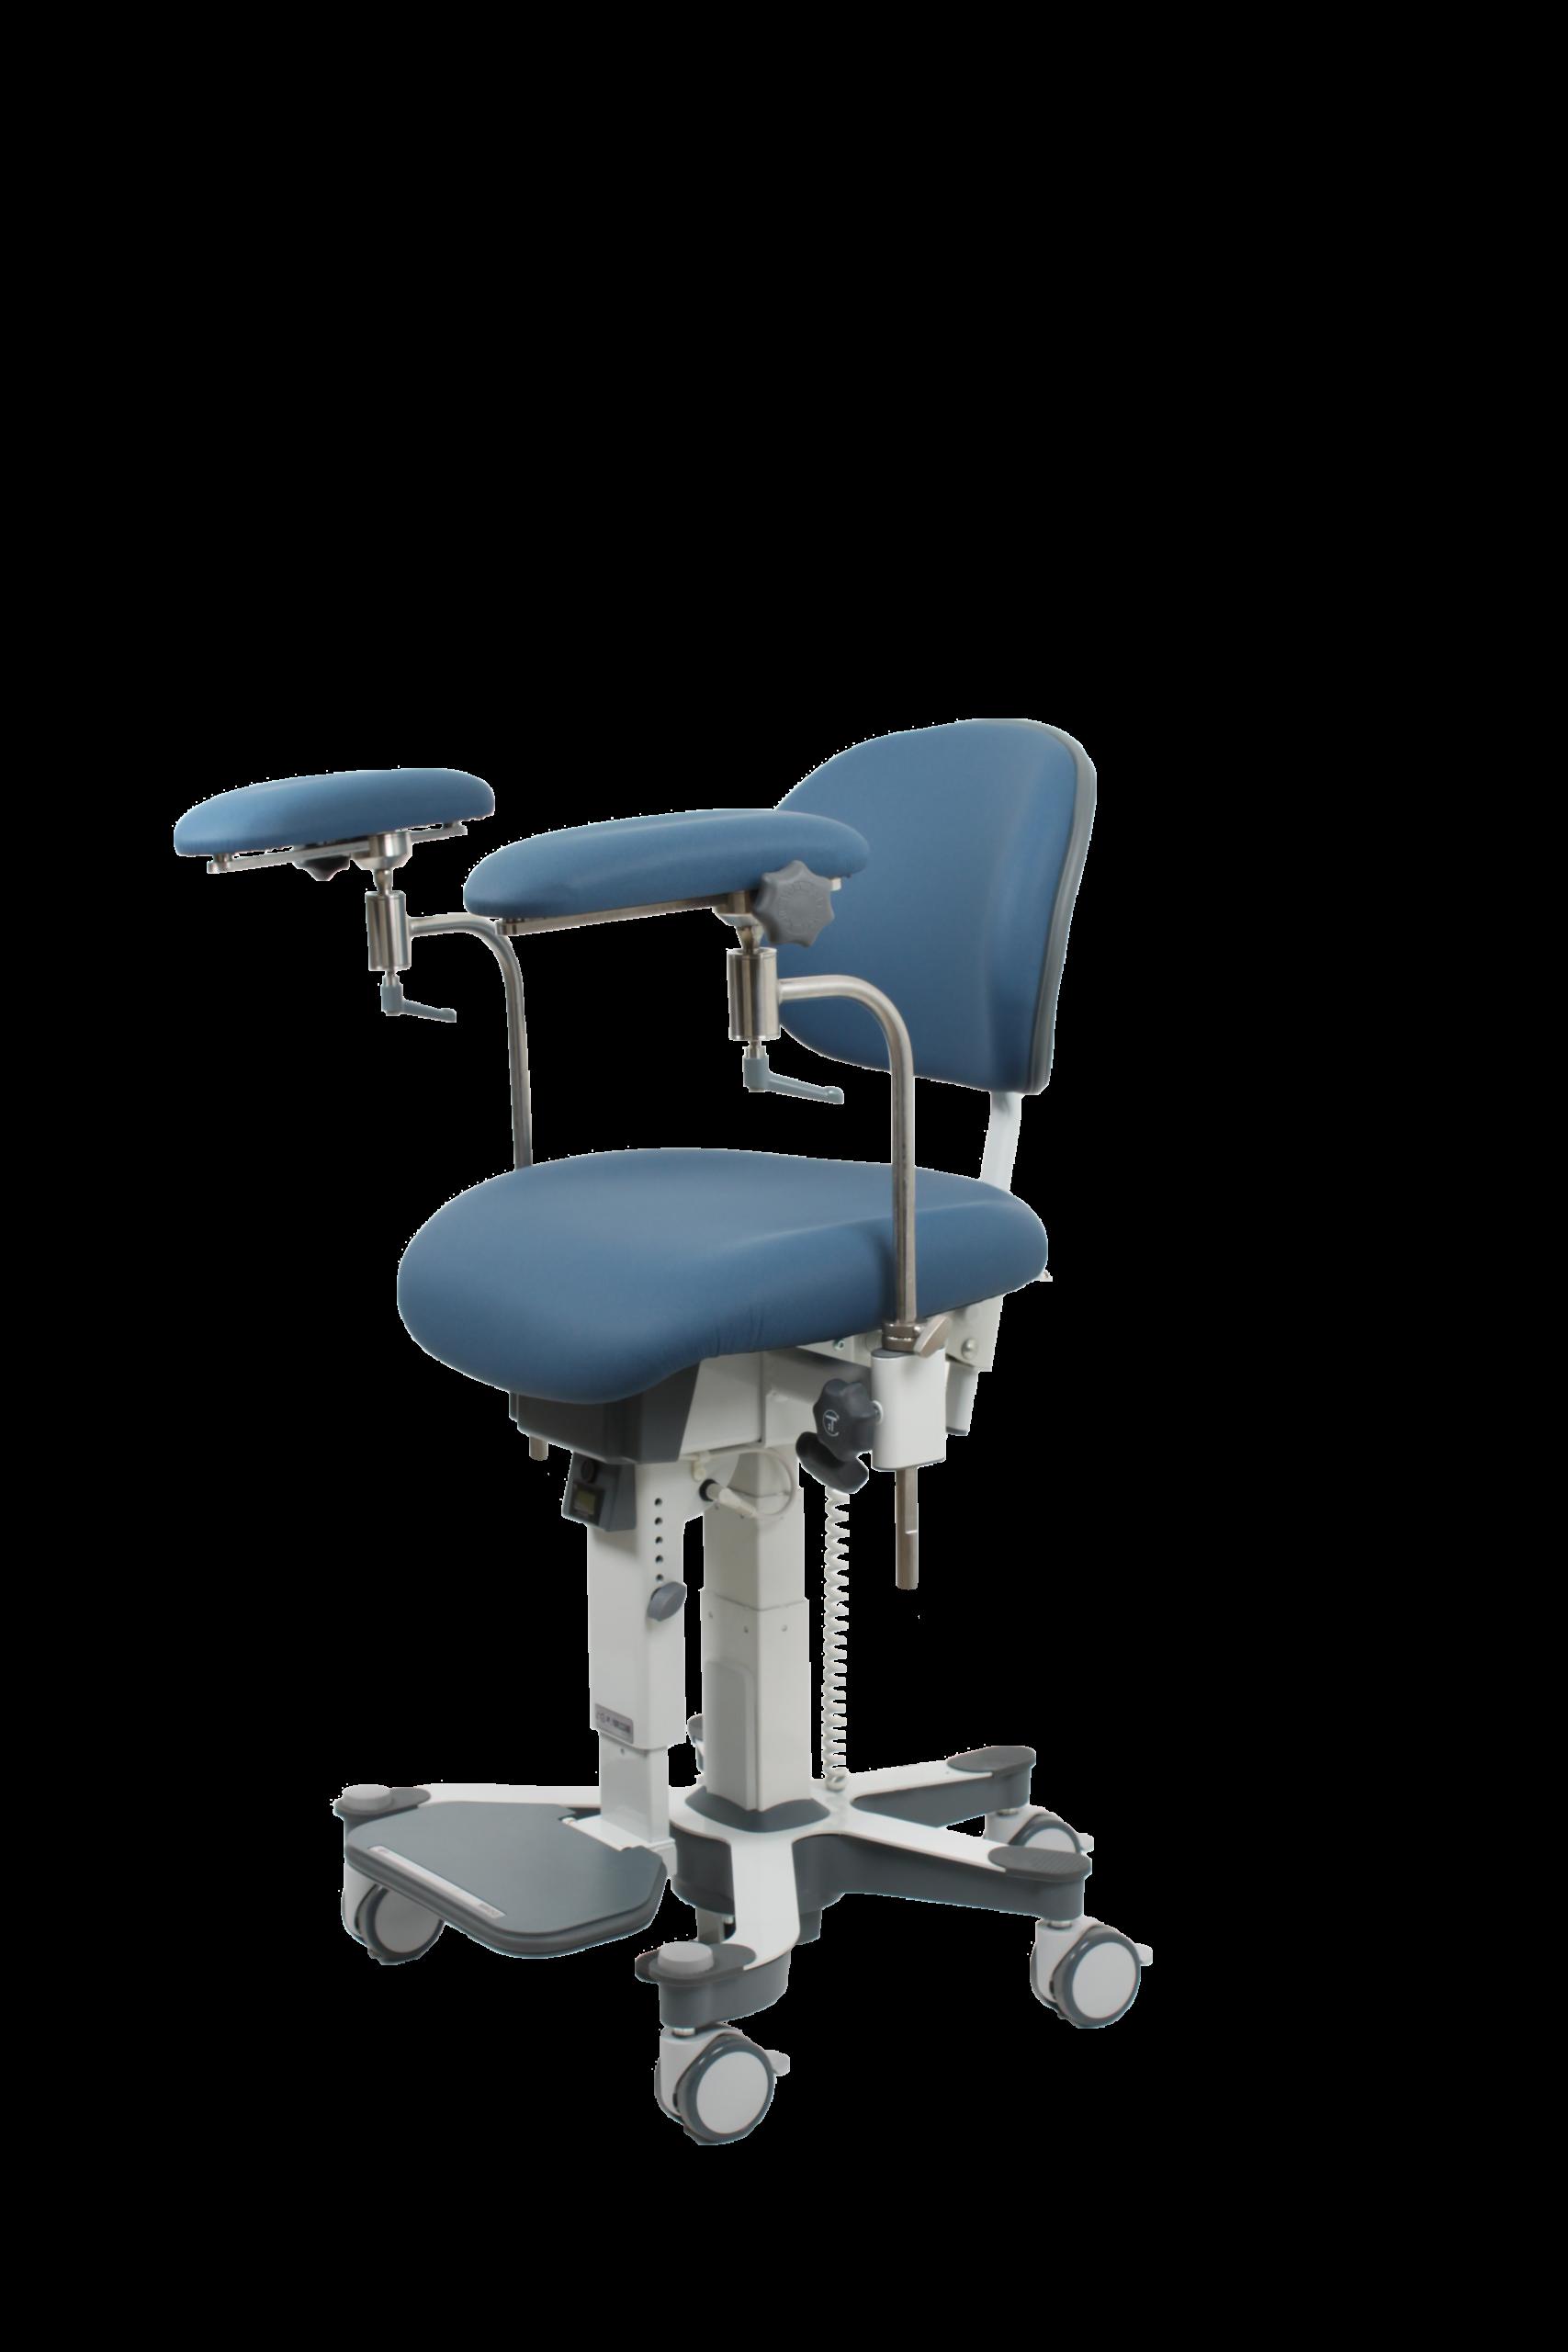 https://www.lameris-group.nl/wp-content/uploads/2020/03/VELA-Support-Surgerons-Chair-fritlagt-scaled.png